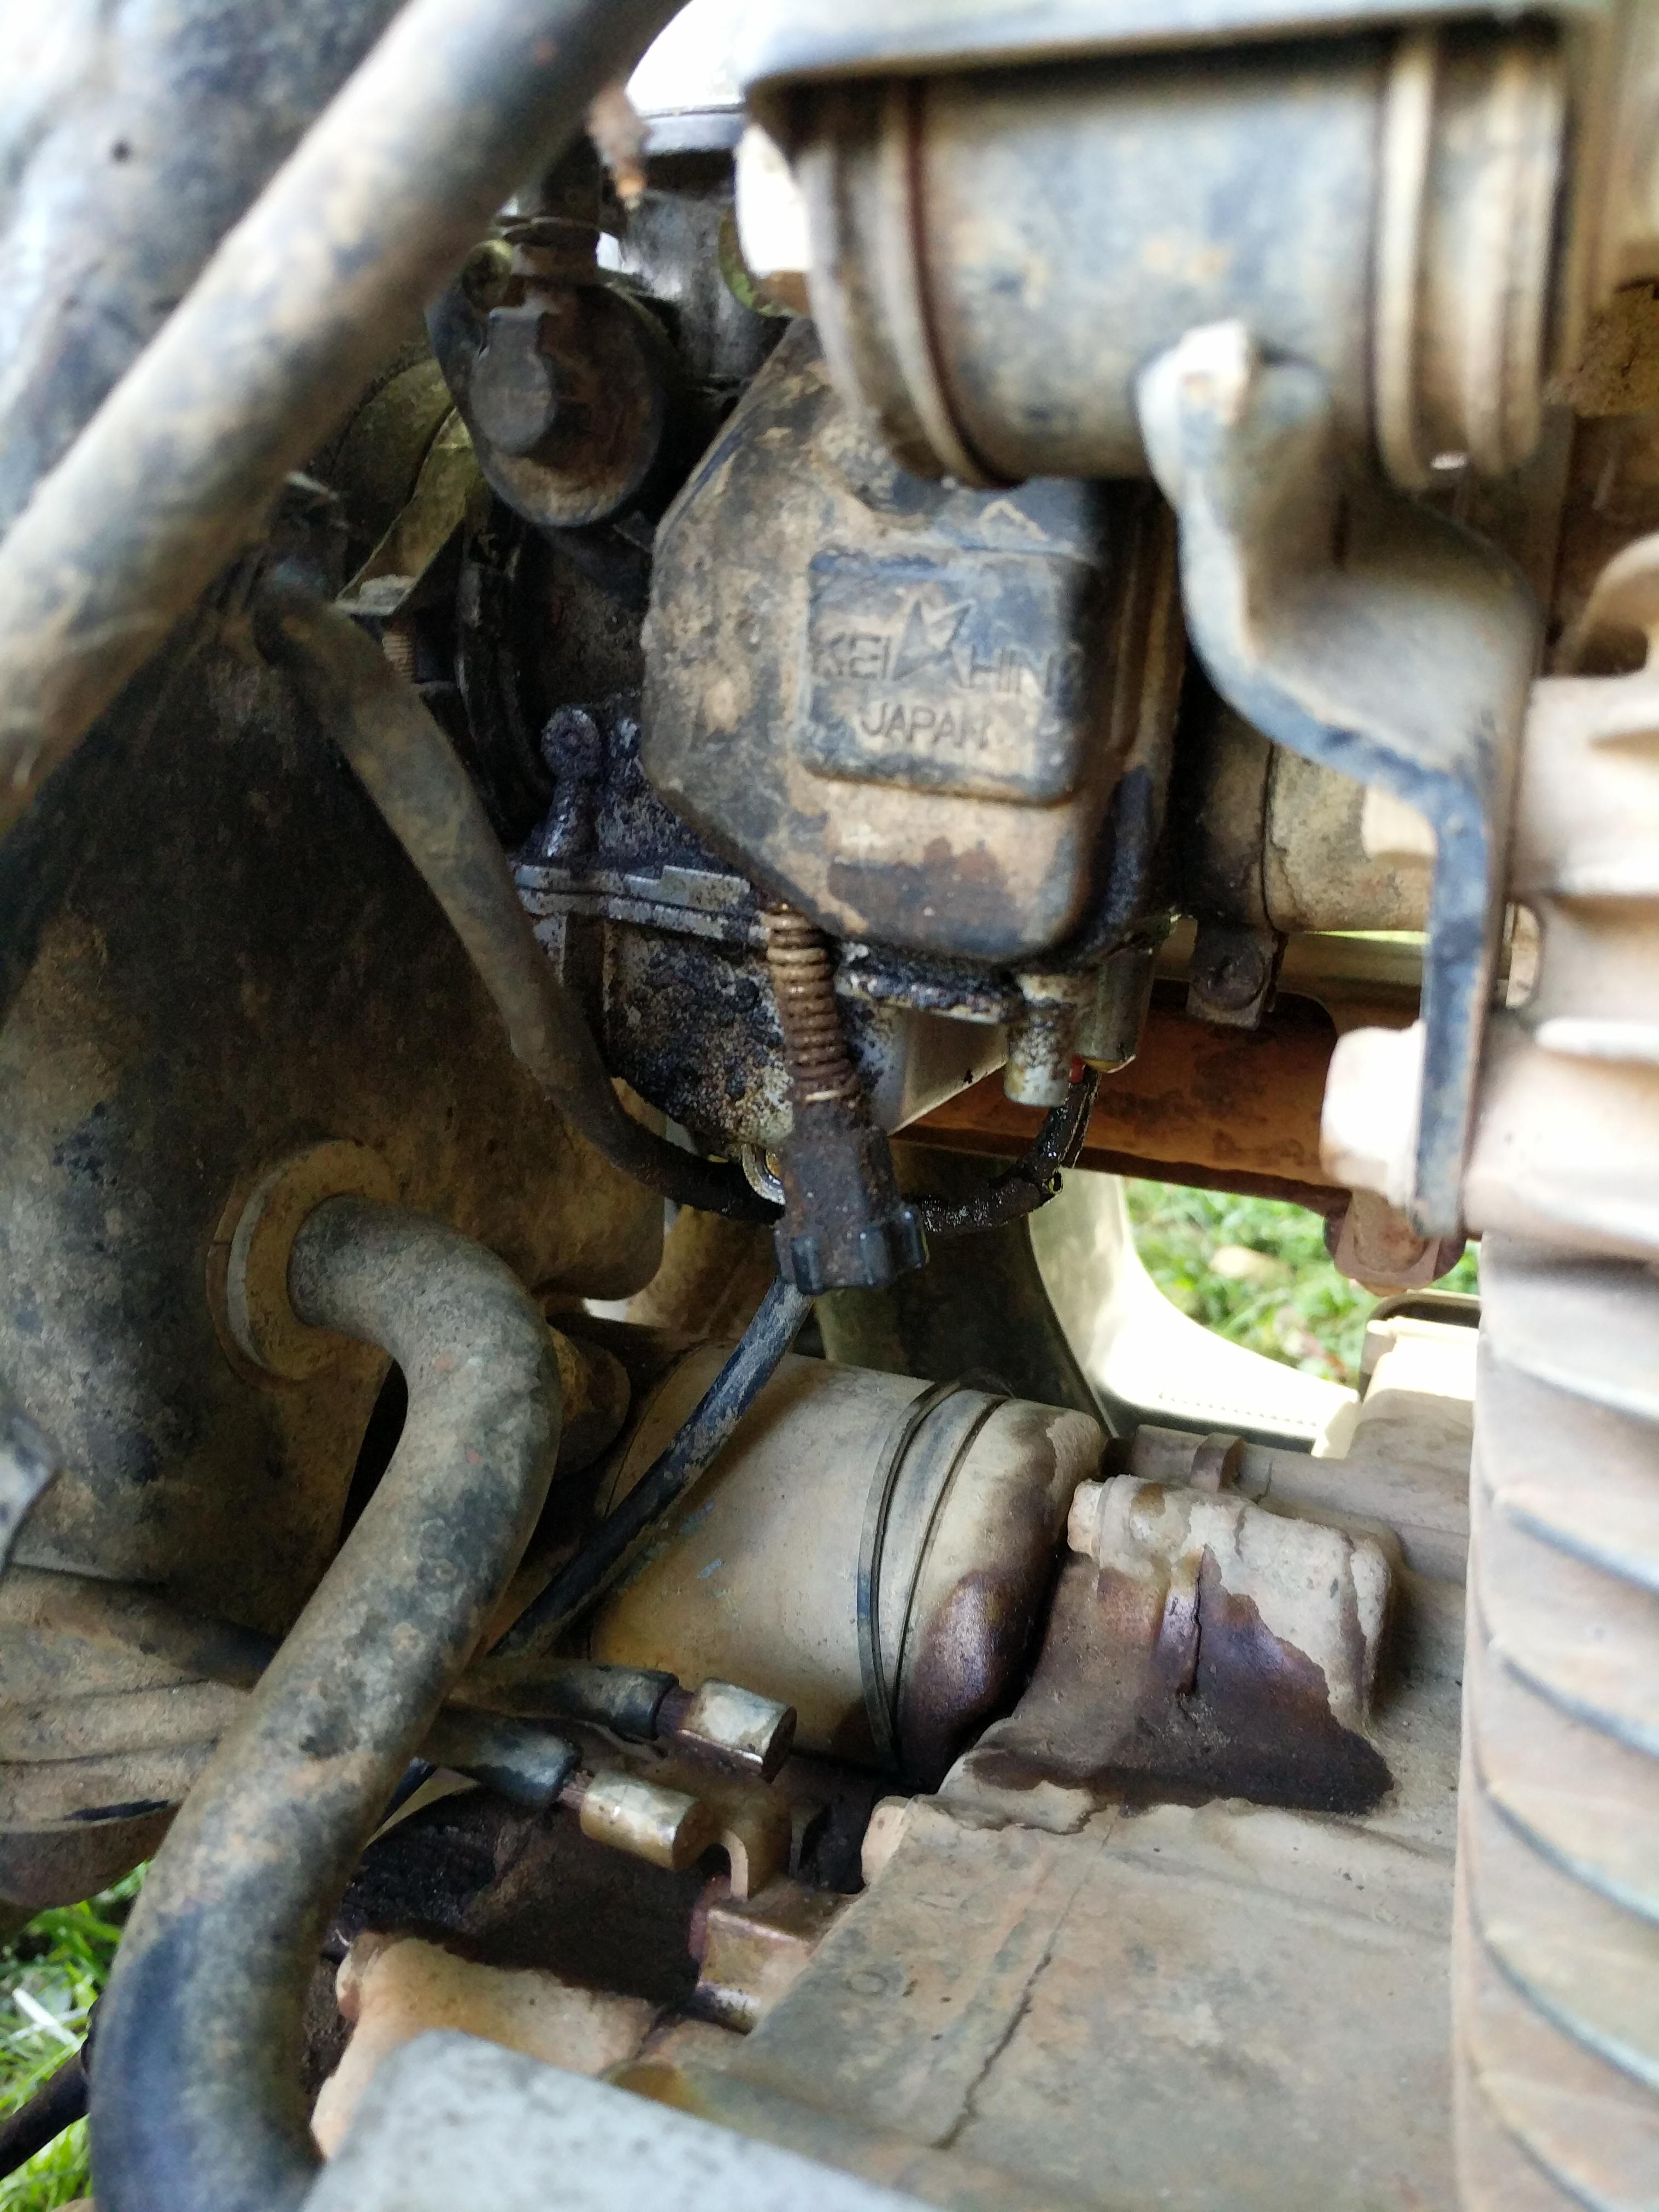 carburetor leaking gas